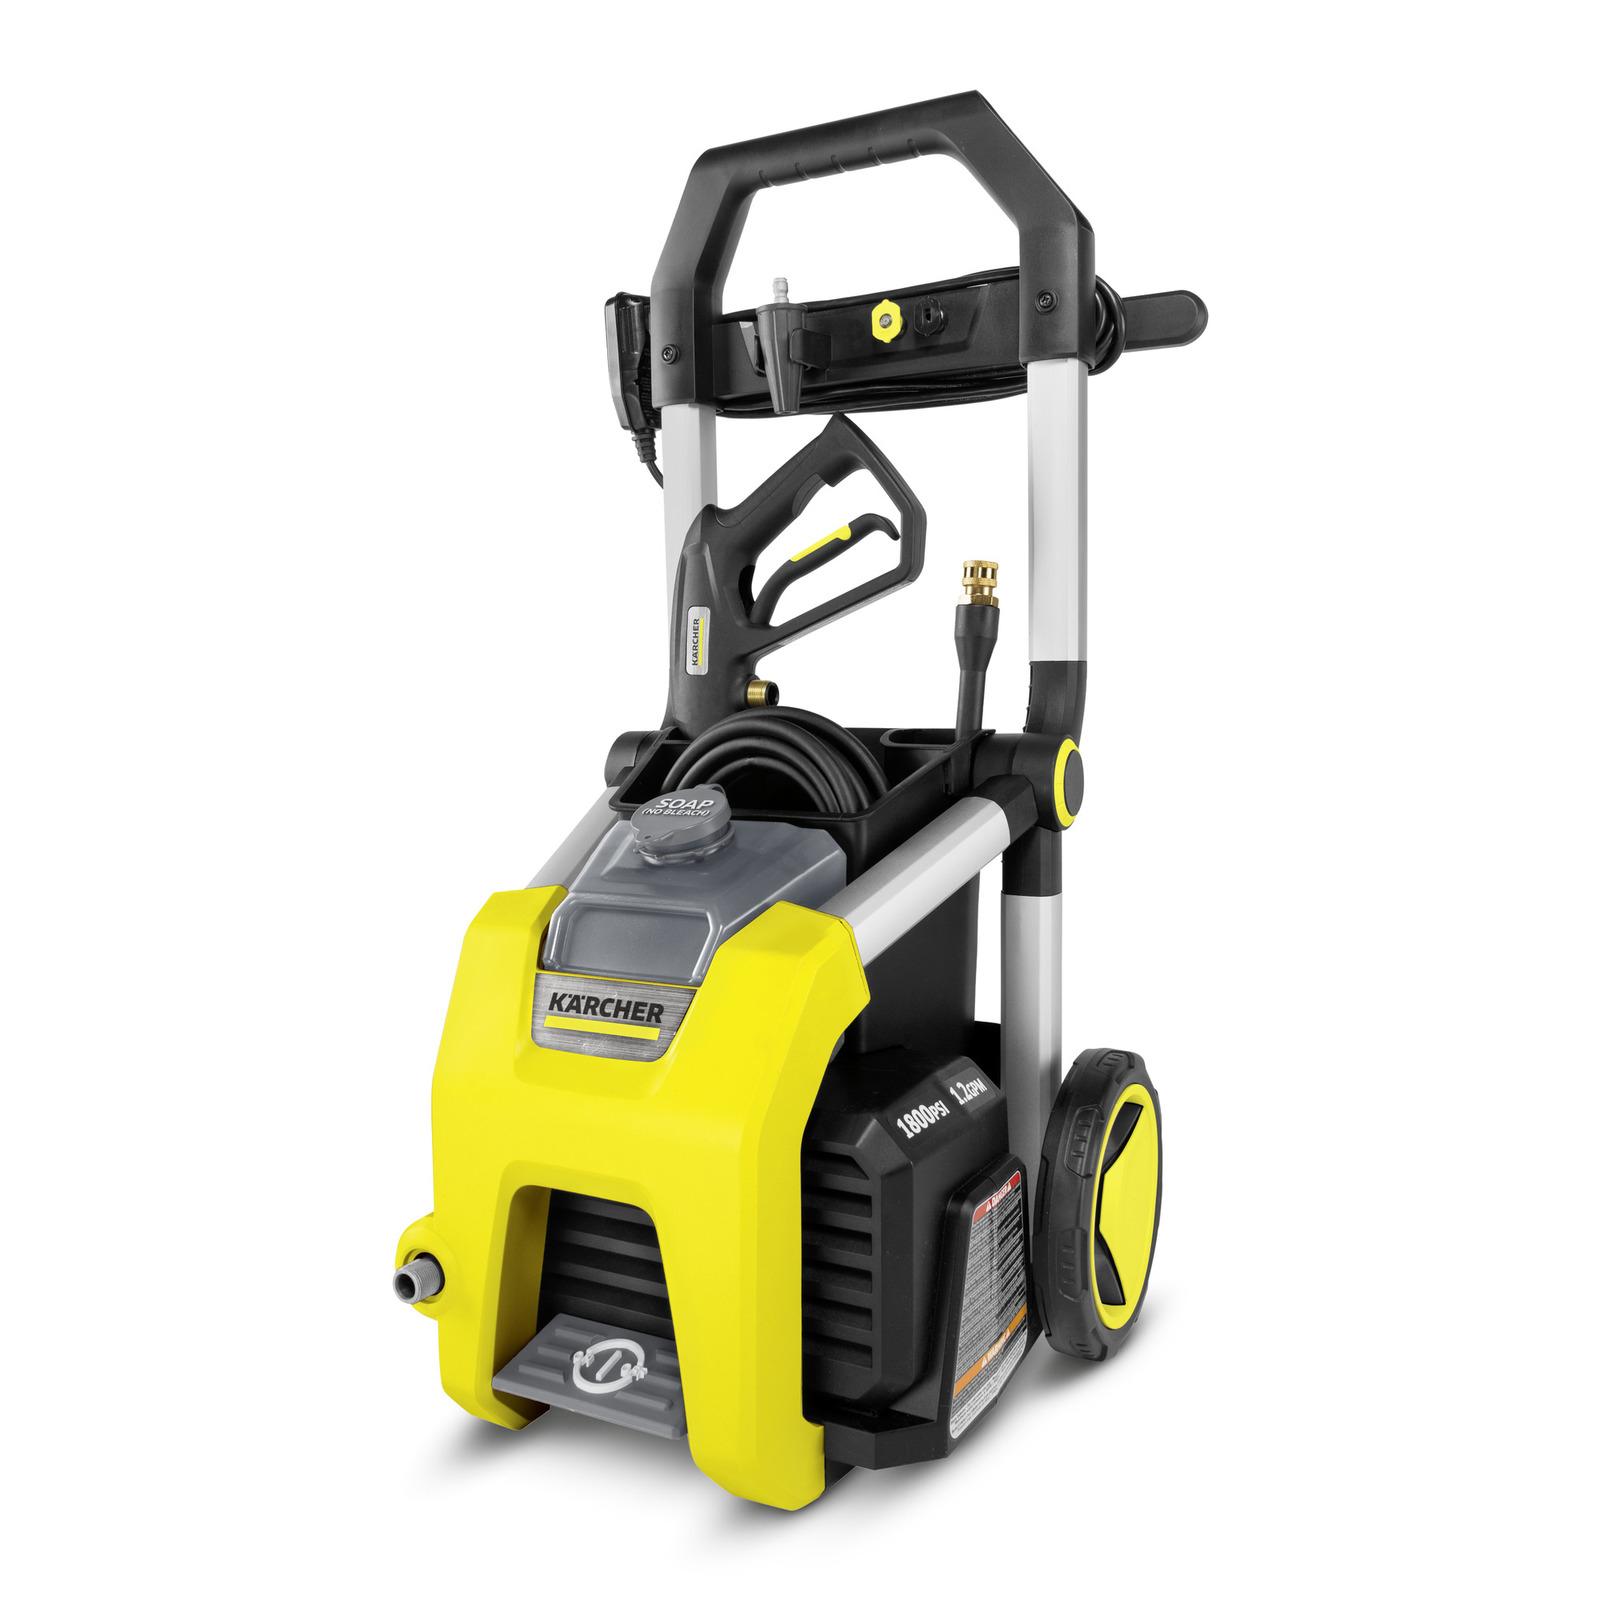 K1800 Electric Pressure Washer 1800 Psi 1 106 110 0